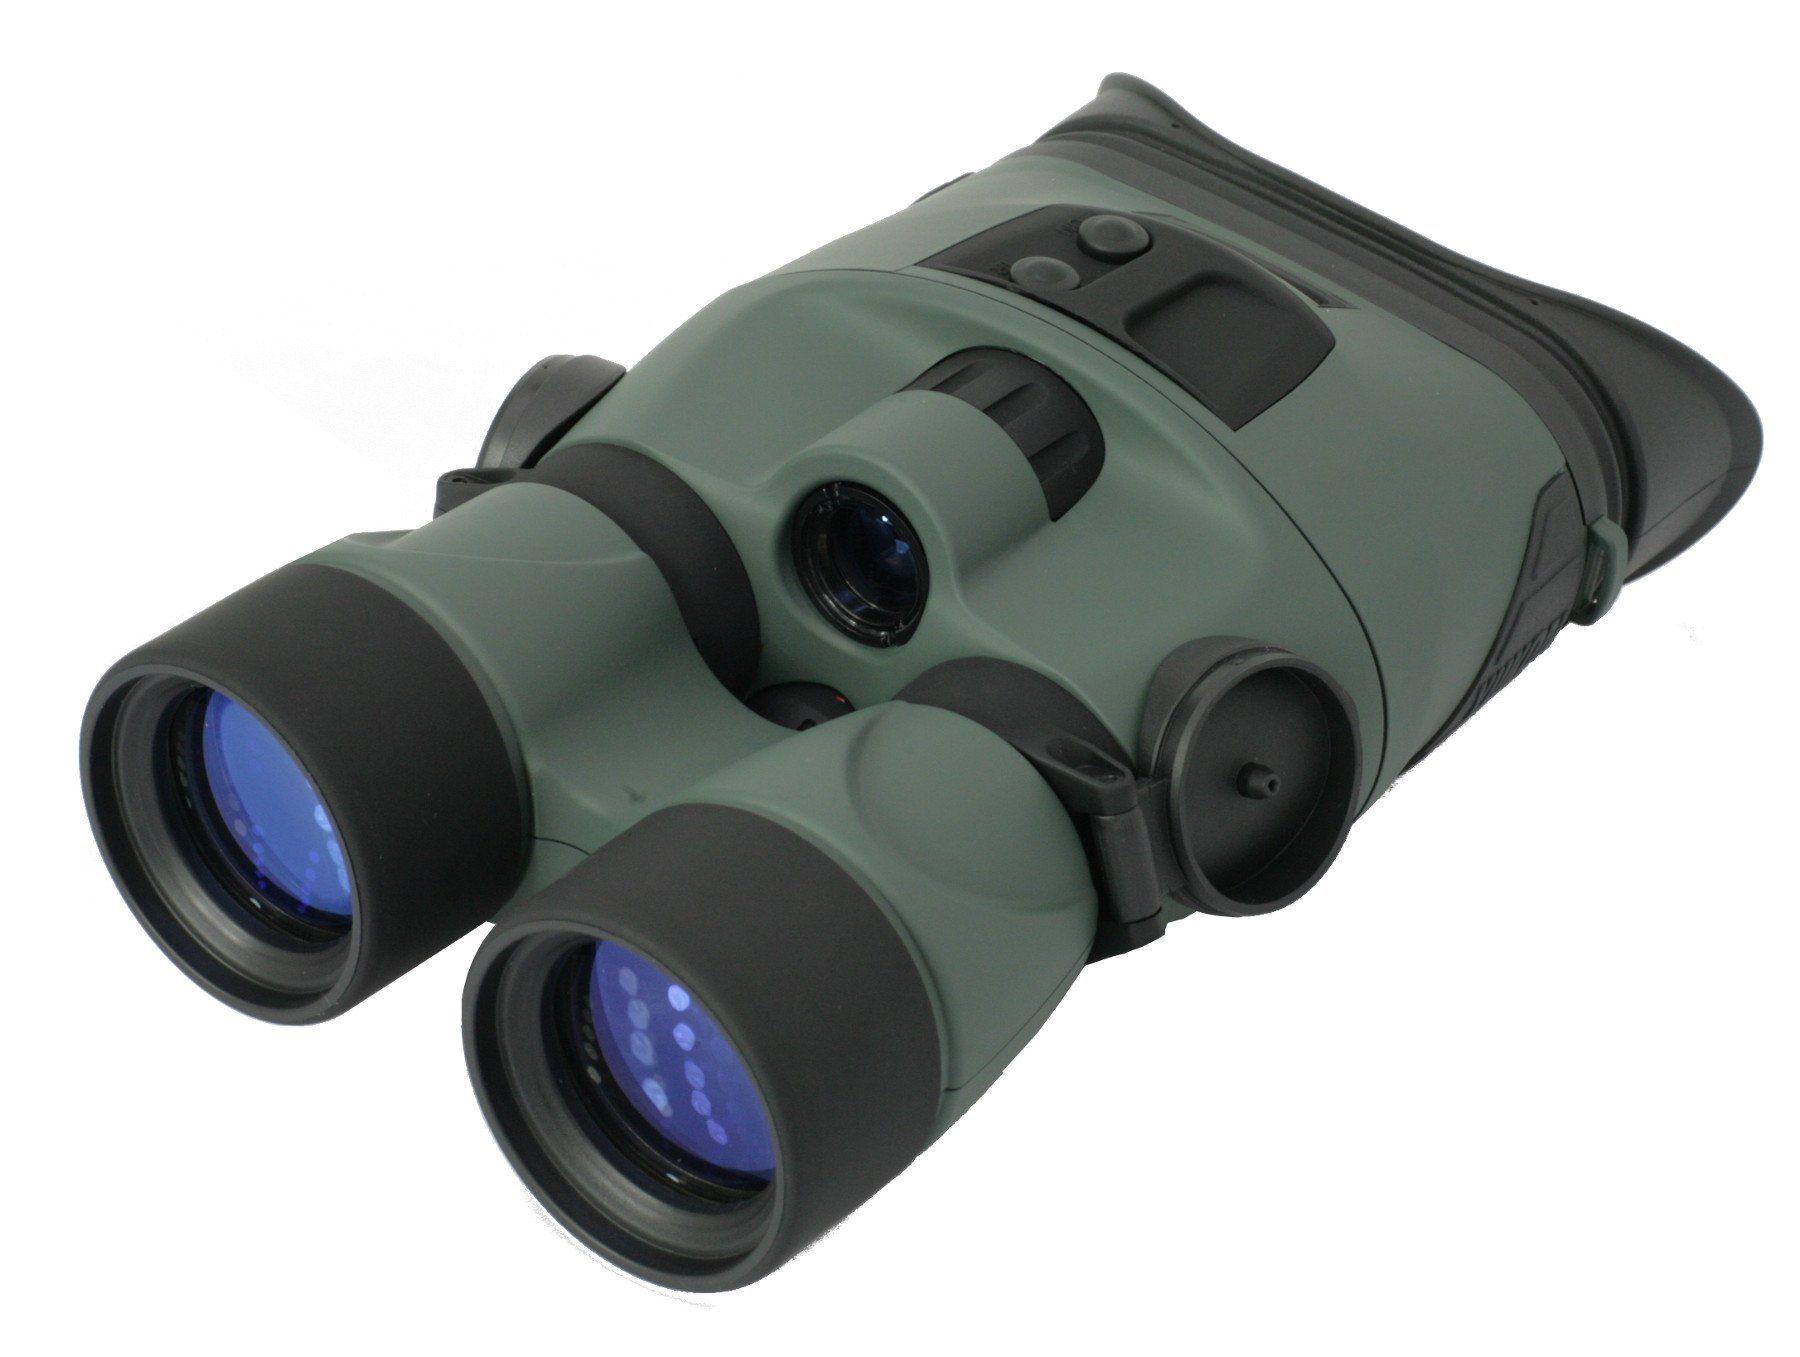 BRESSER Nachtsichterät »YUKON NVB Tracker RX 3,5x40 Binok. Nachtsichtgerät«